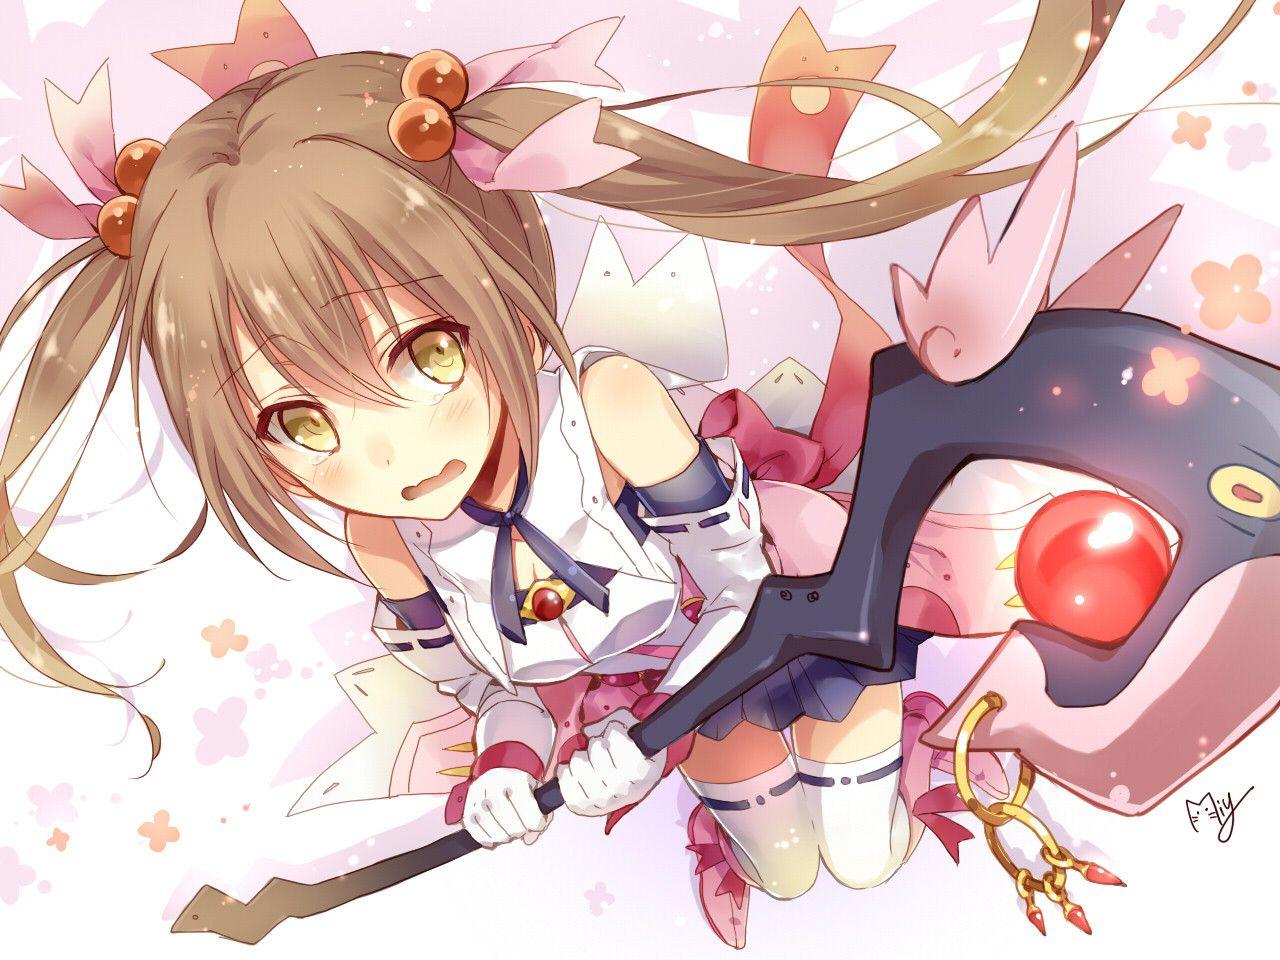 Hentai Moon inside master anime ecchi hentai picture wallpapers magic girls armor